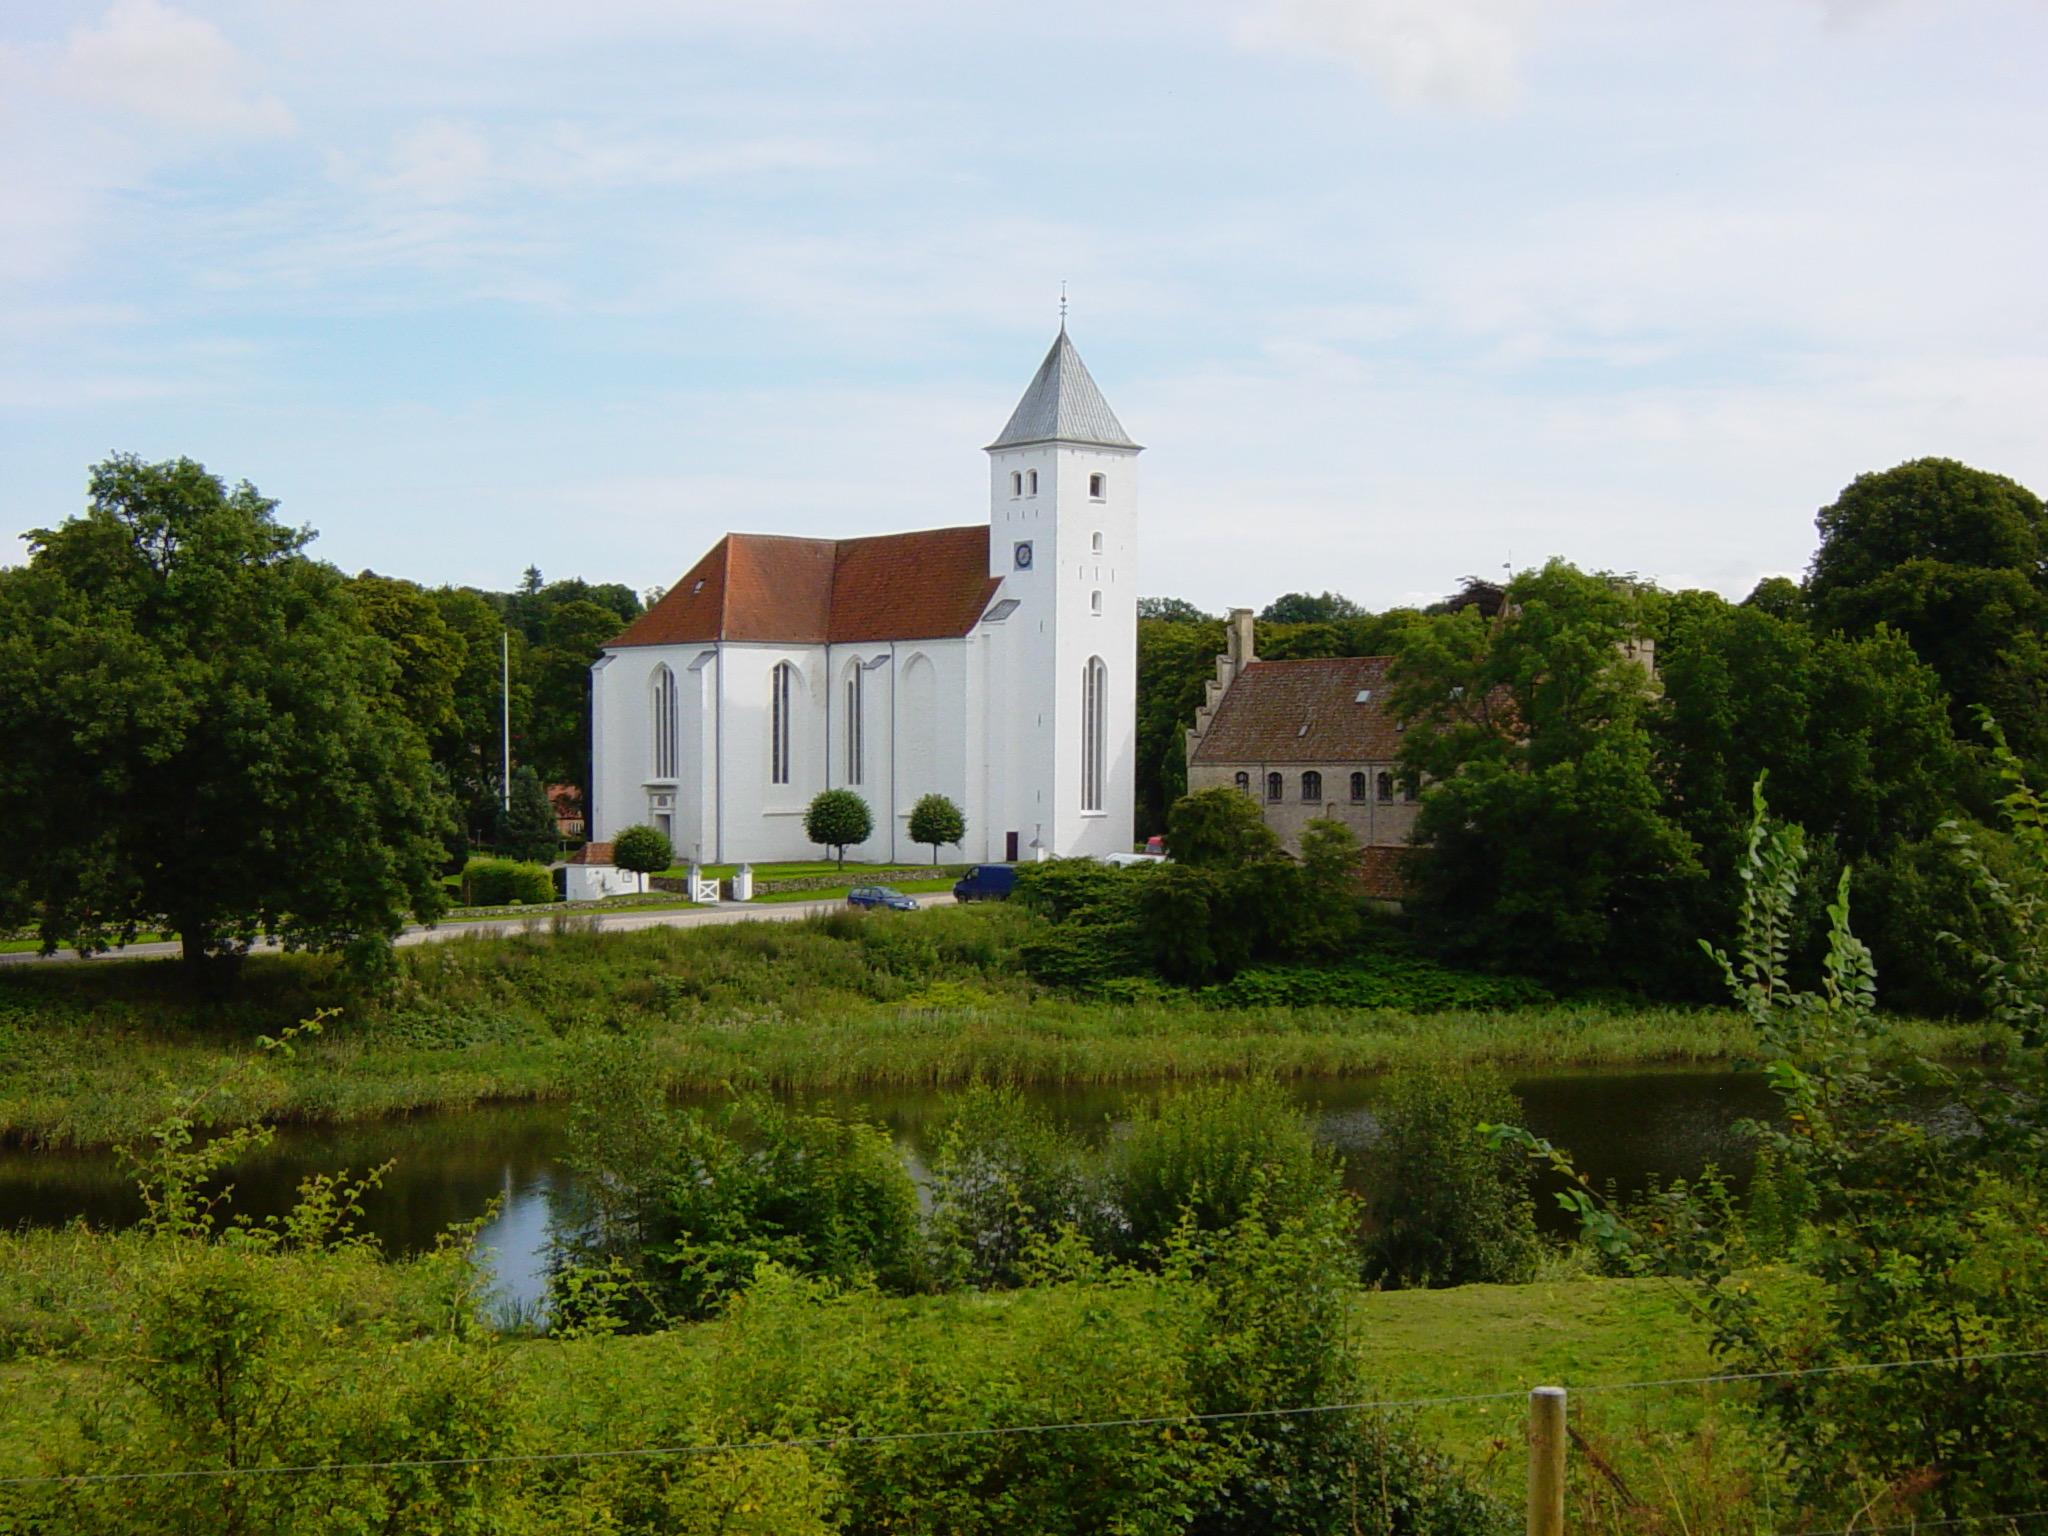 Mariager Church, Denmark